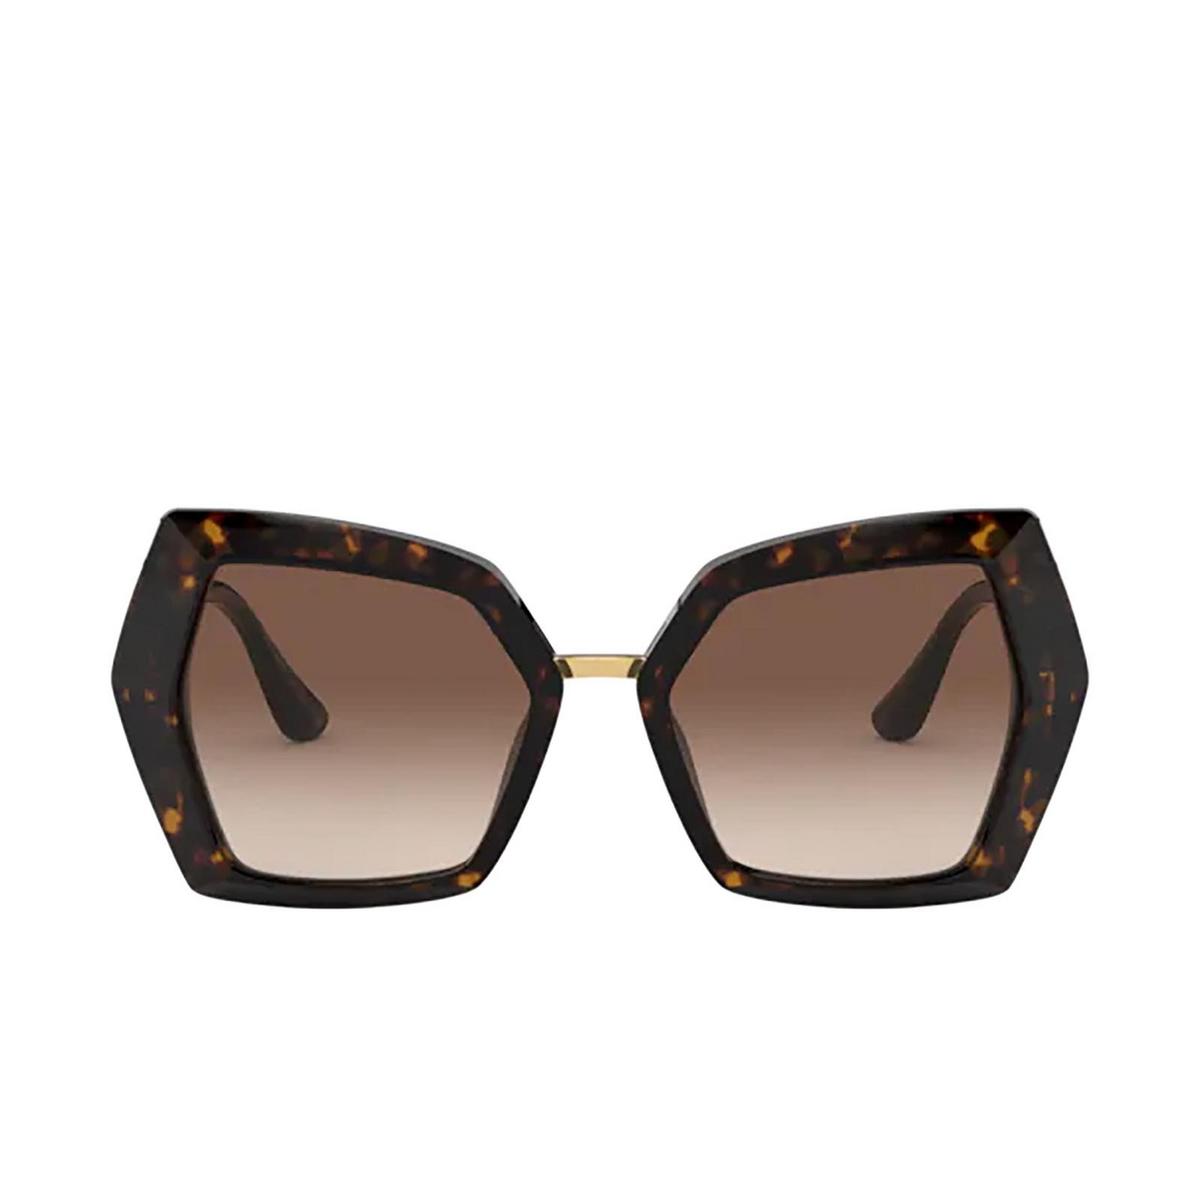 Dolce & Gabbana® Butterfly Sunglasses: DG4377 color Havana 502/13.